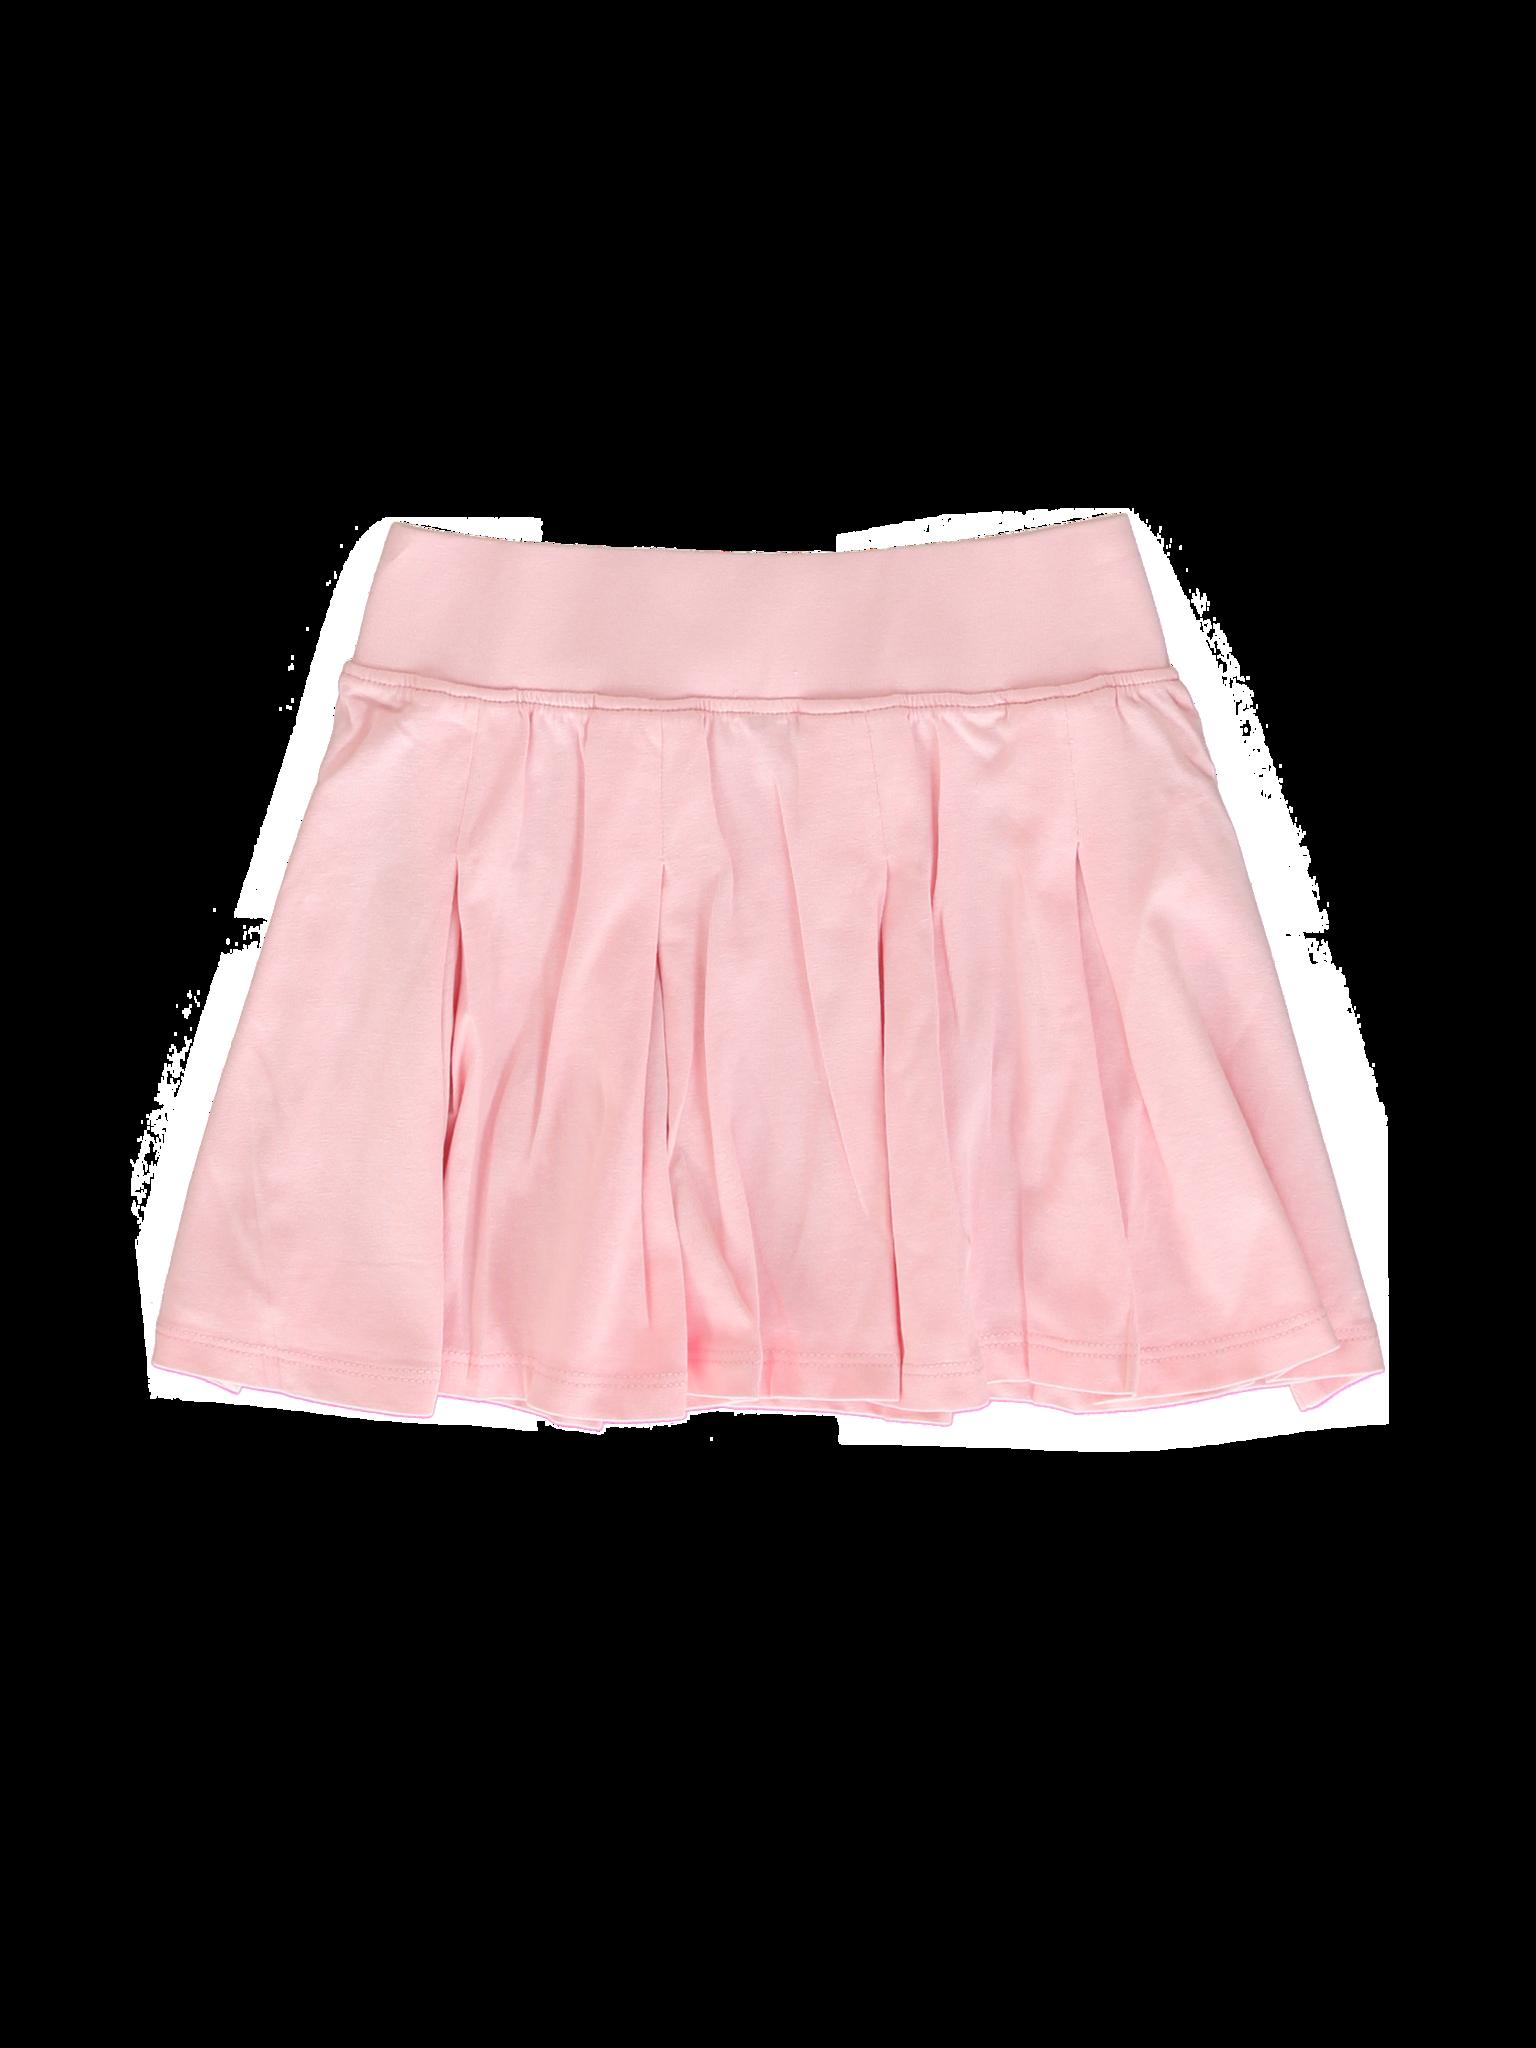 All Brands | Summerproducts Small Girls | Skirt | 18 pcs/box